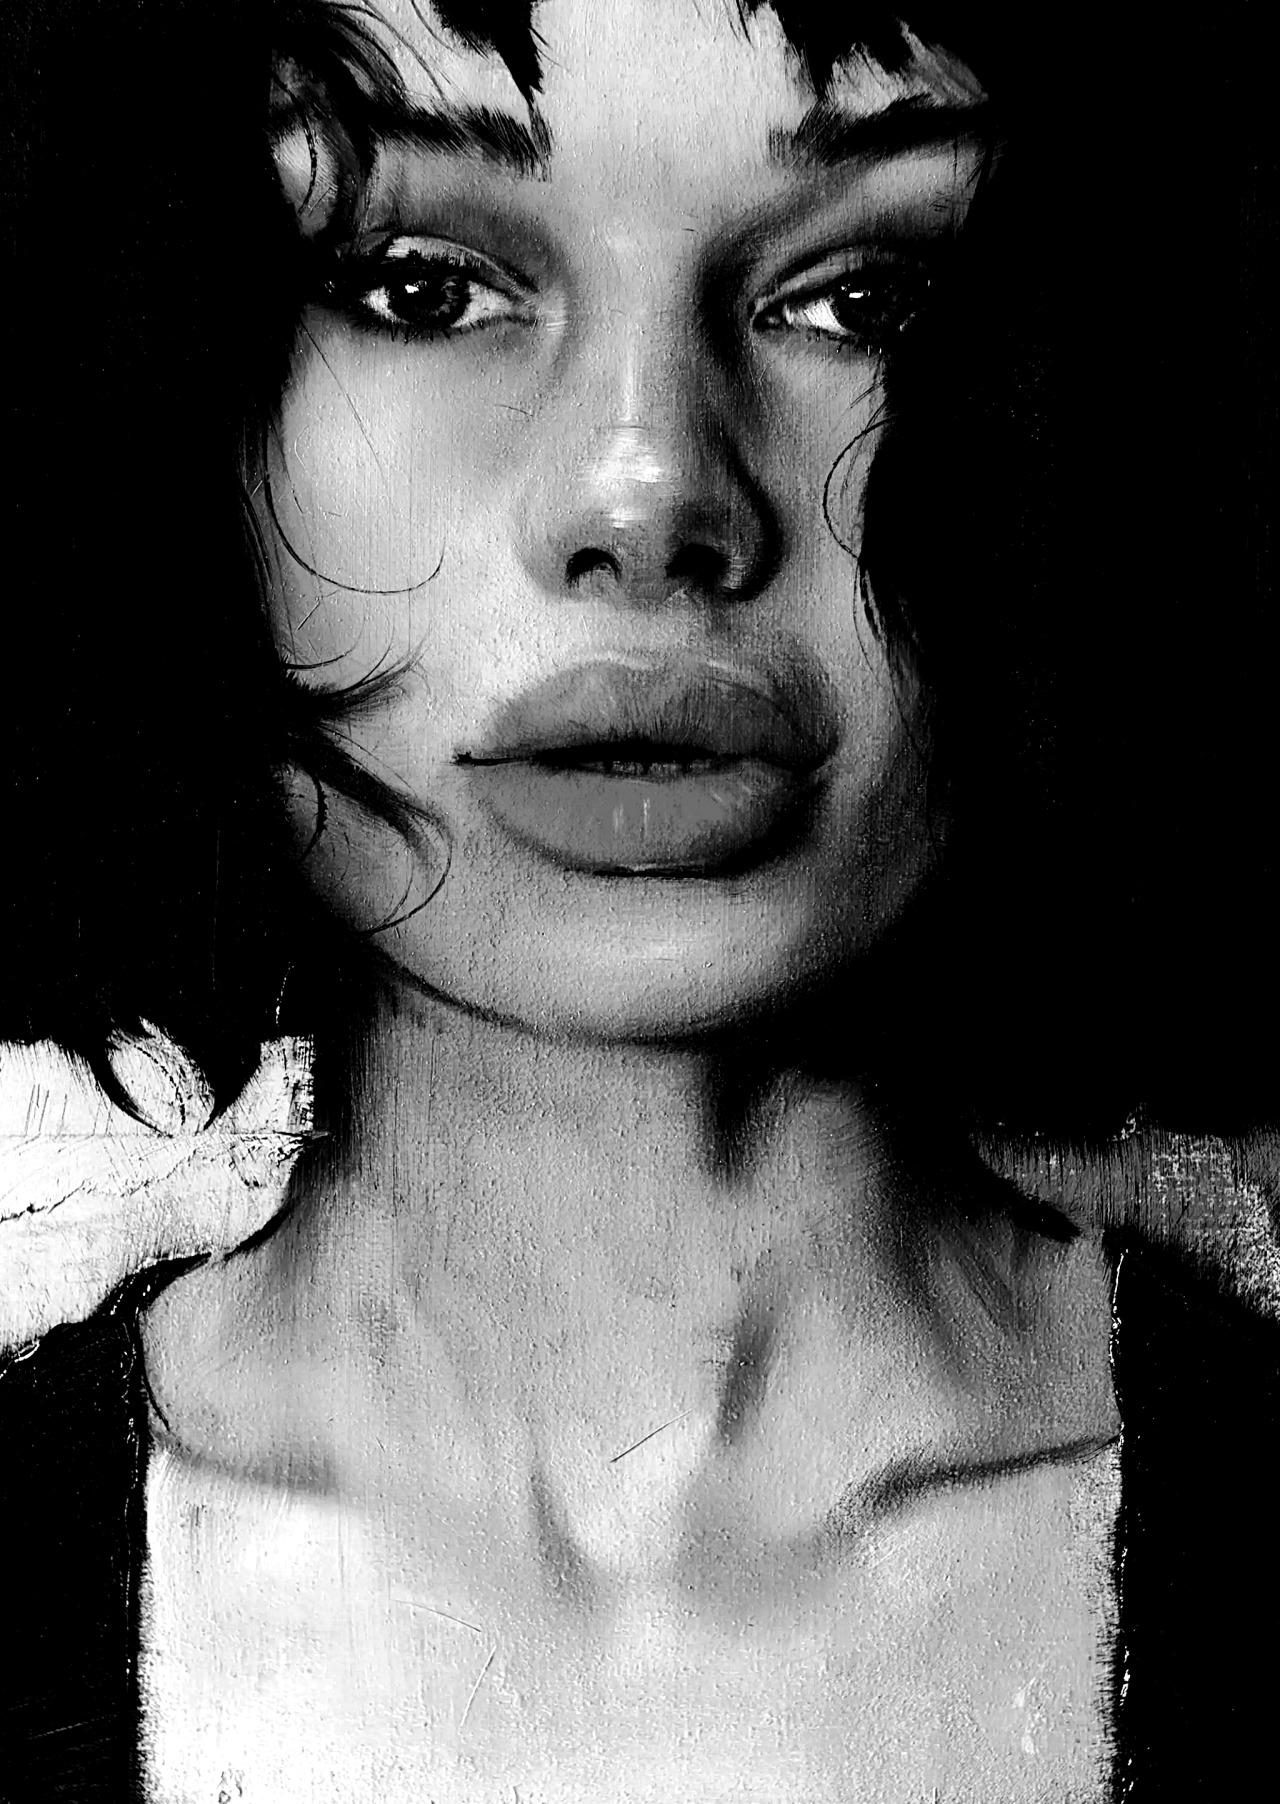 J Louis Pillars, 2020 16 × 12 in / 40.6 × 30.5 cm #j louis#art#paintings#portraits#art edits#faces